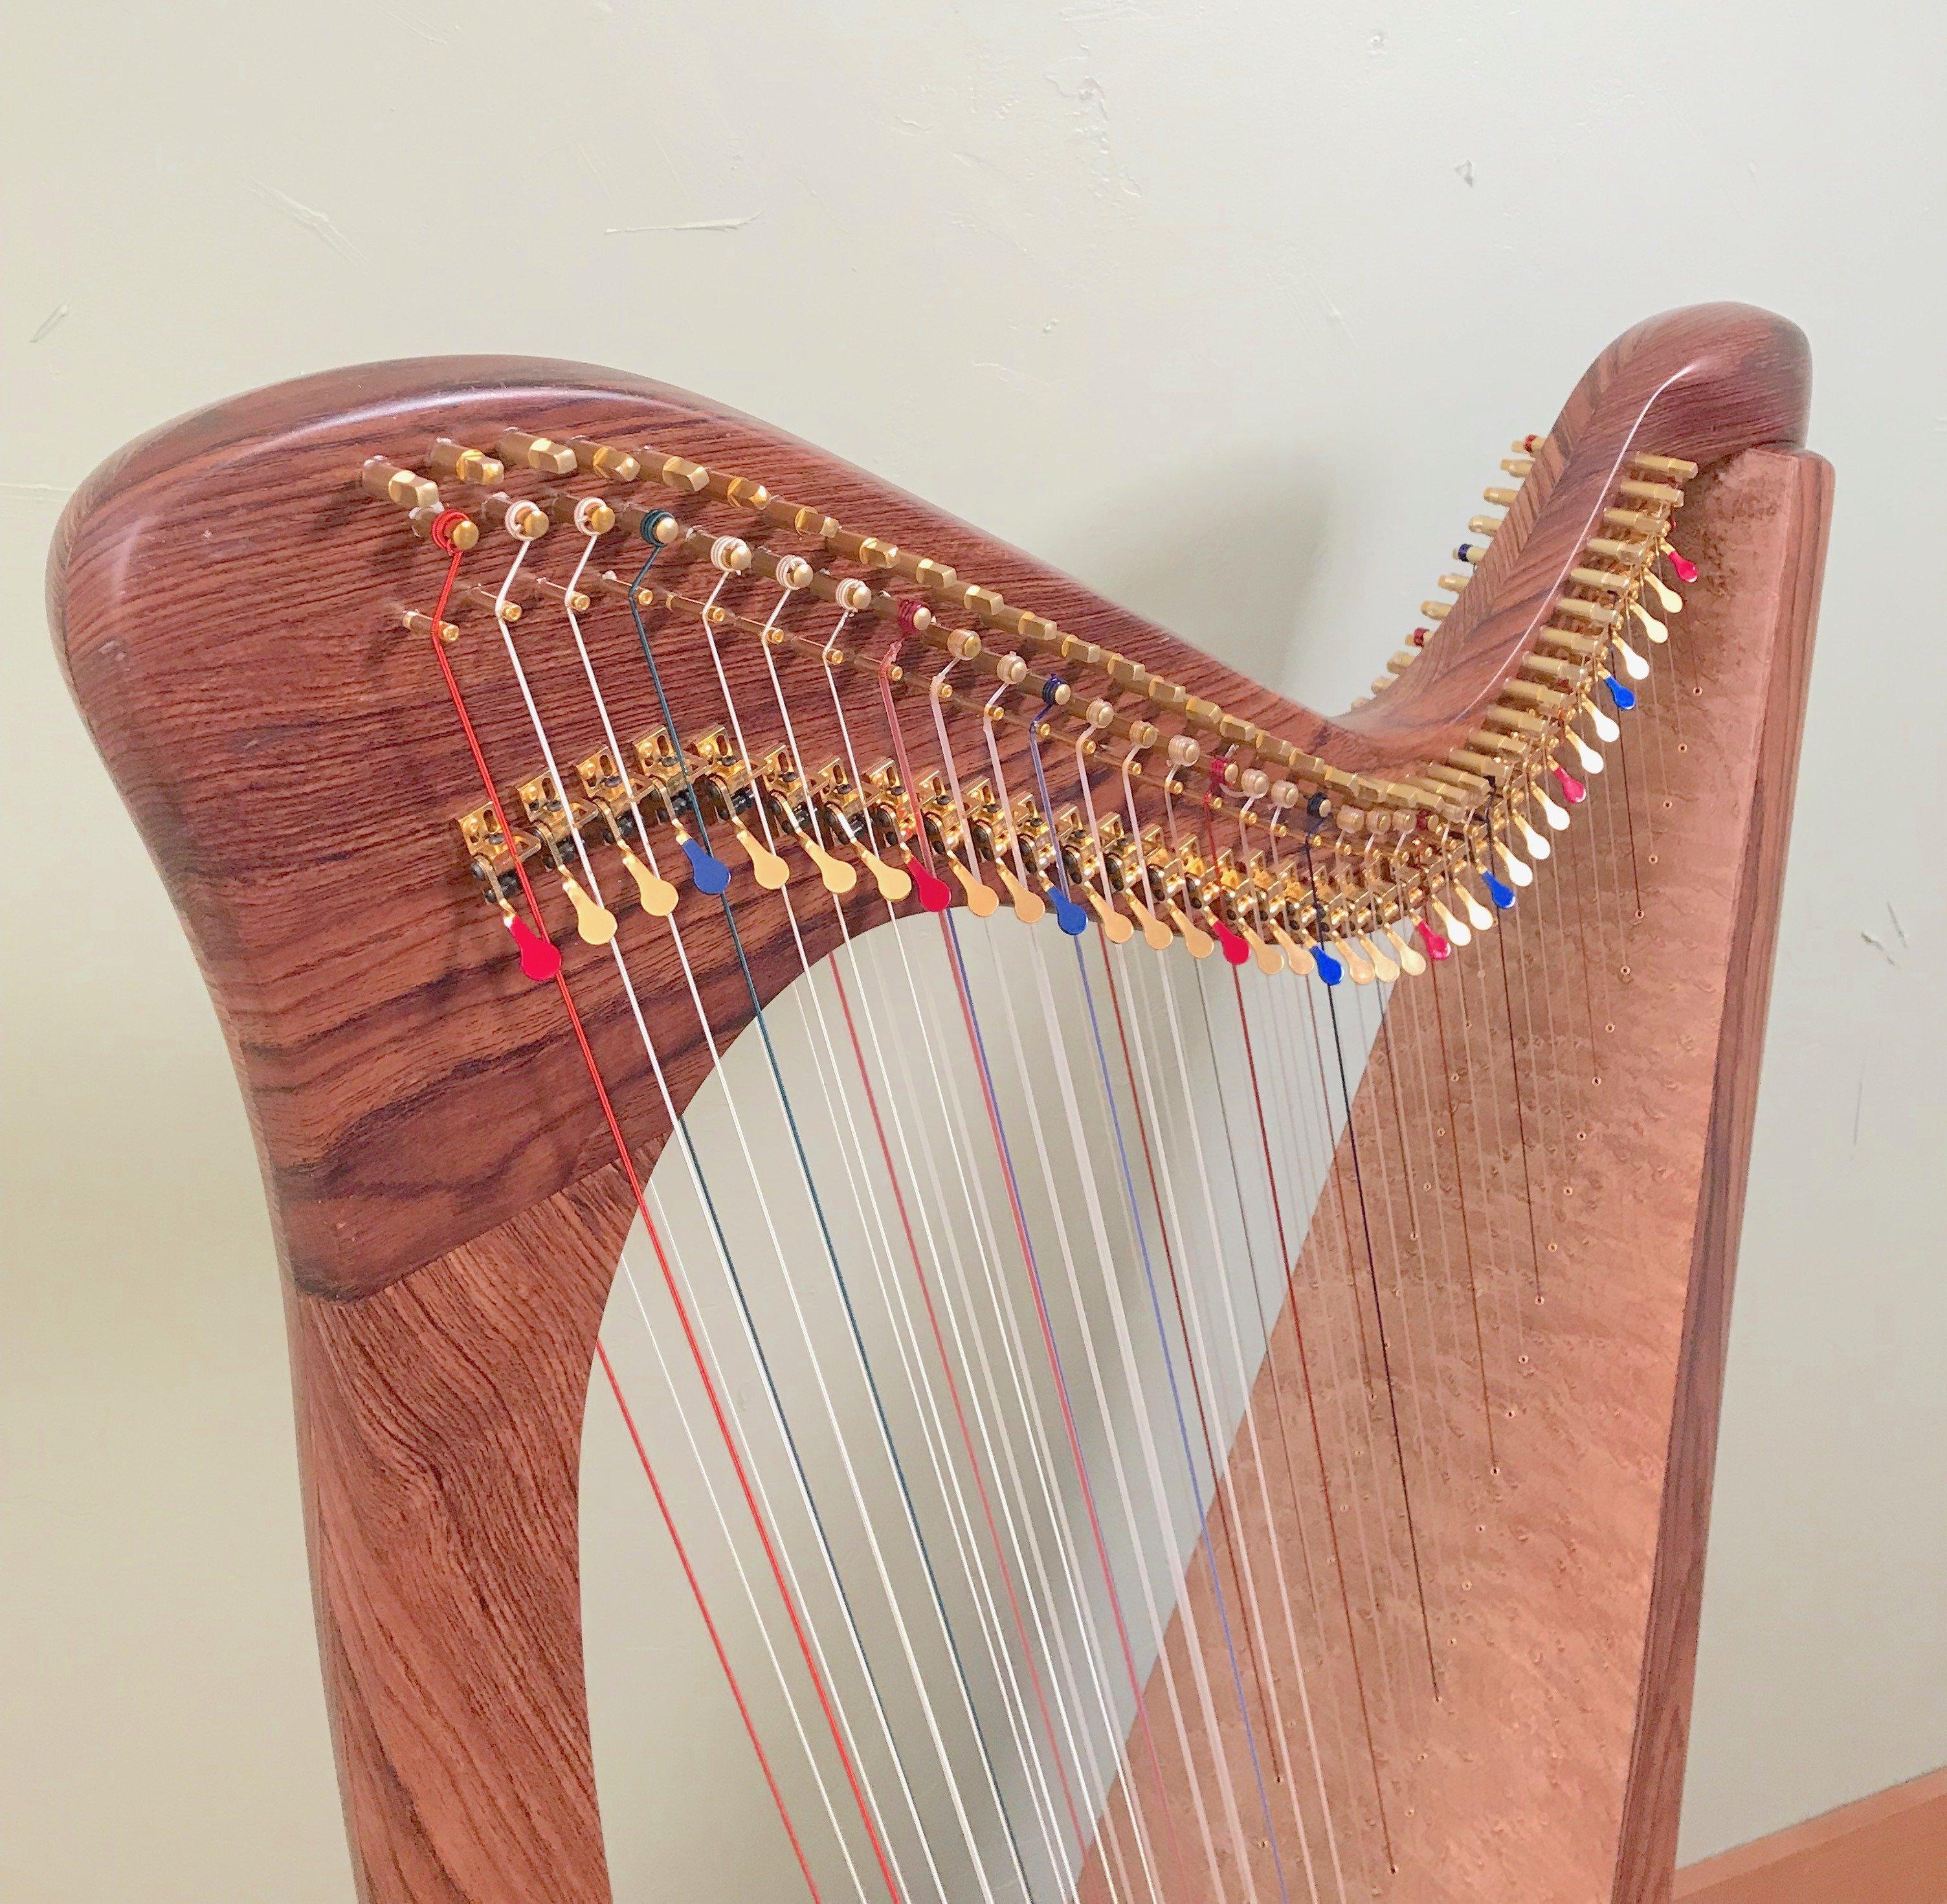 carbon fiber harp with wood grain finish